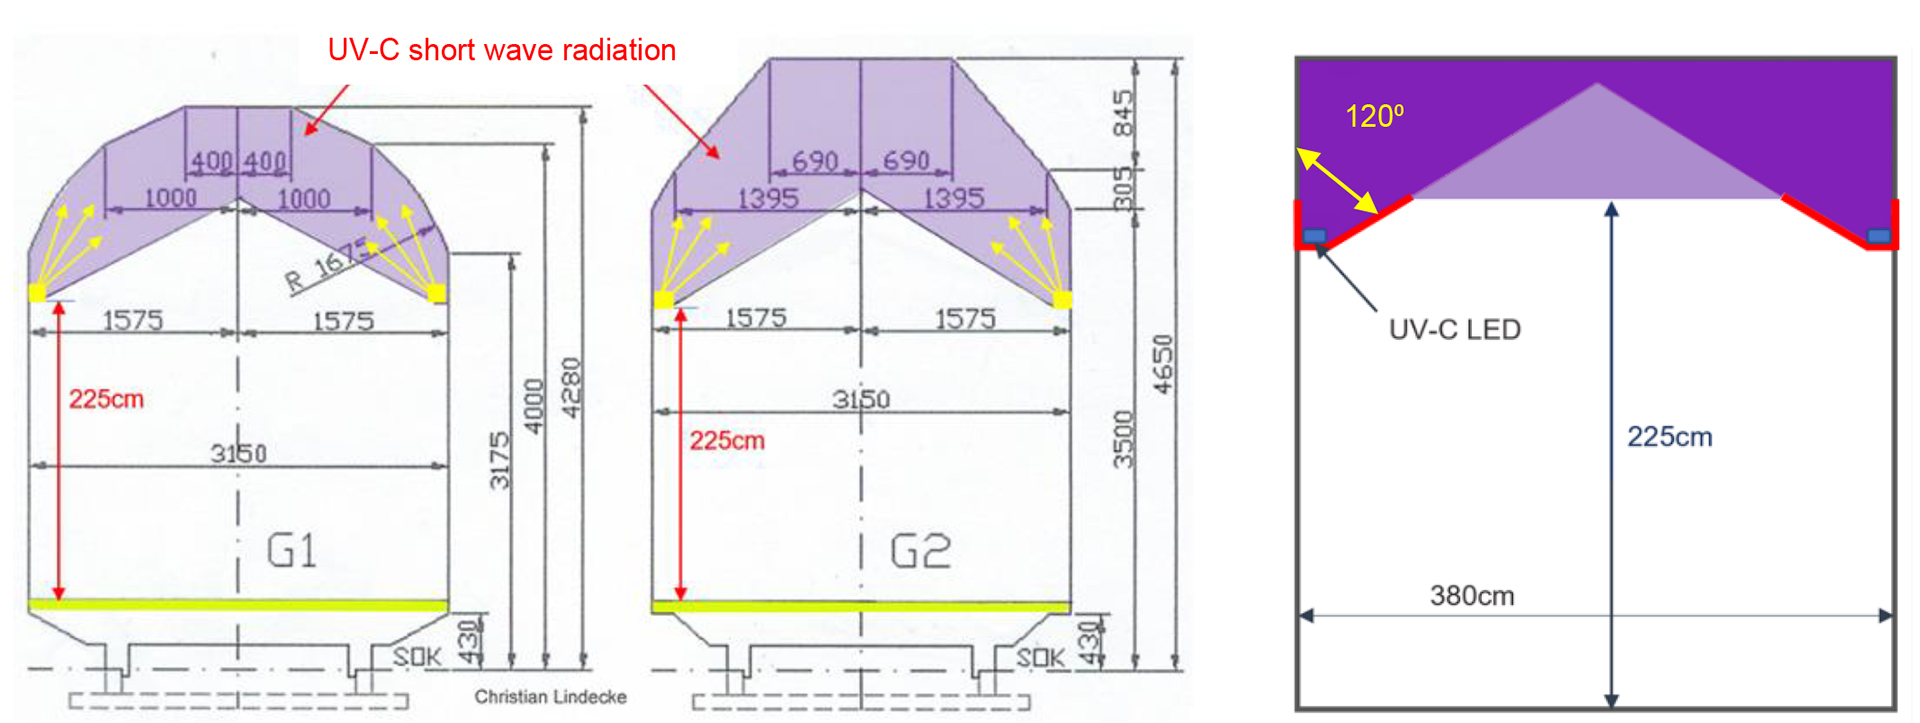 AIR-BORN UV-C Flexible LED strip BBM Clean Air Solutions UV-C short wave radiation